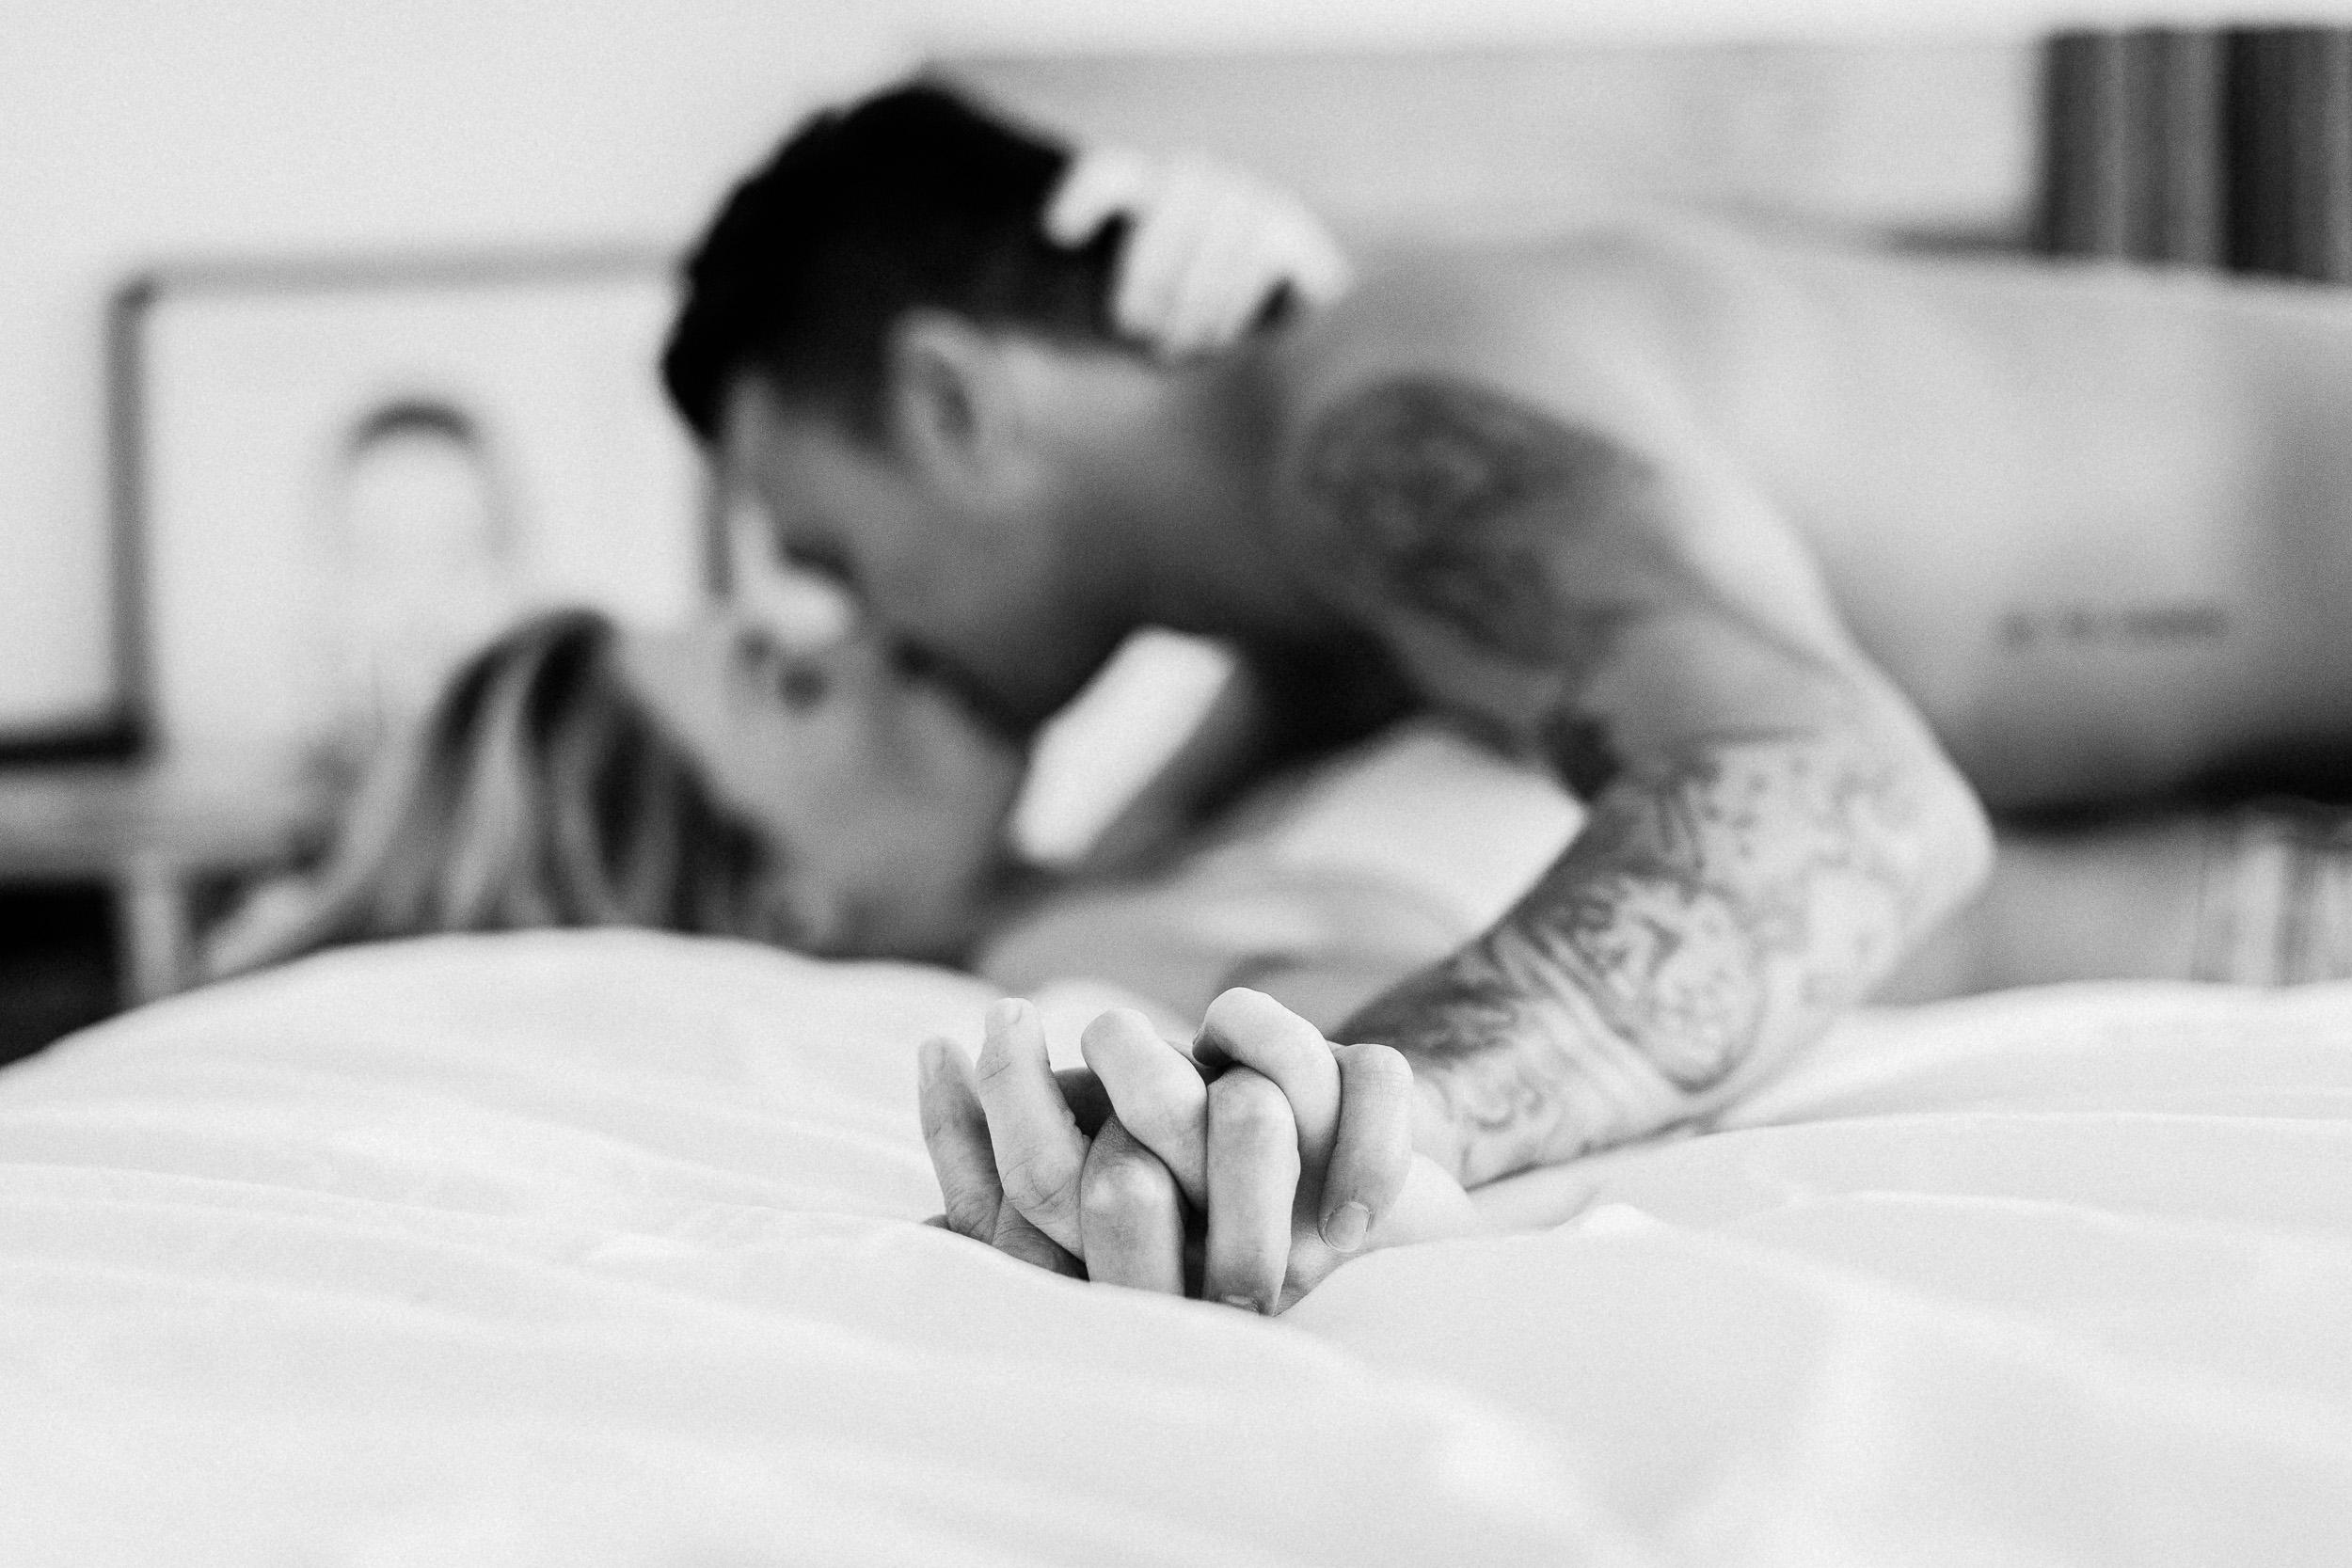 couples-boudoir-fotoshoot-11.jpg